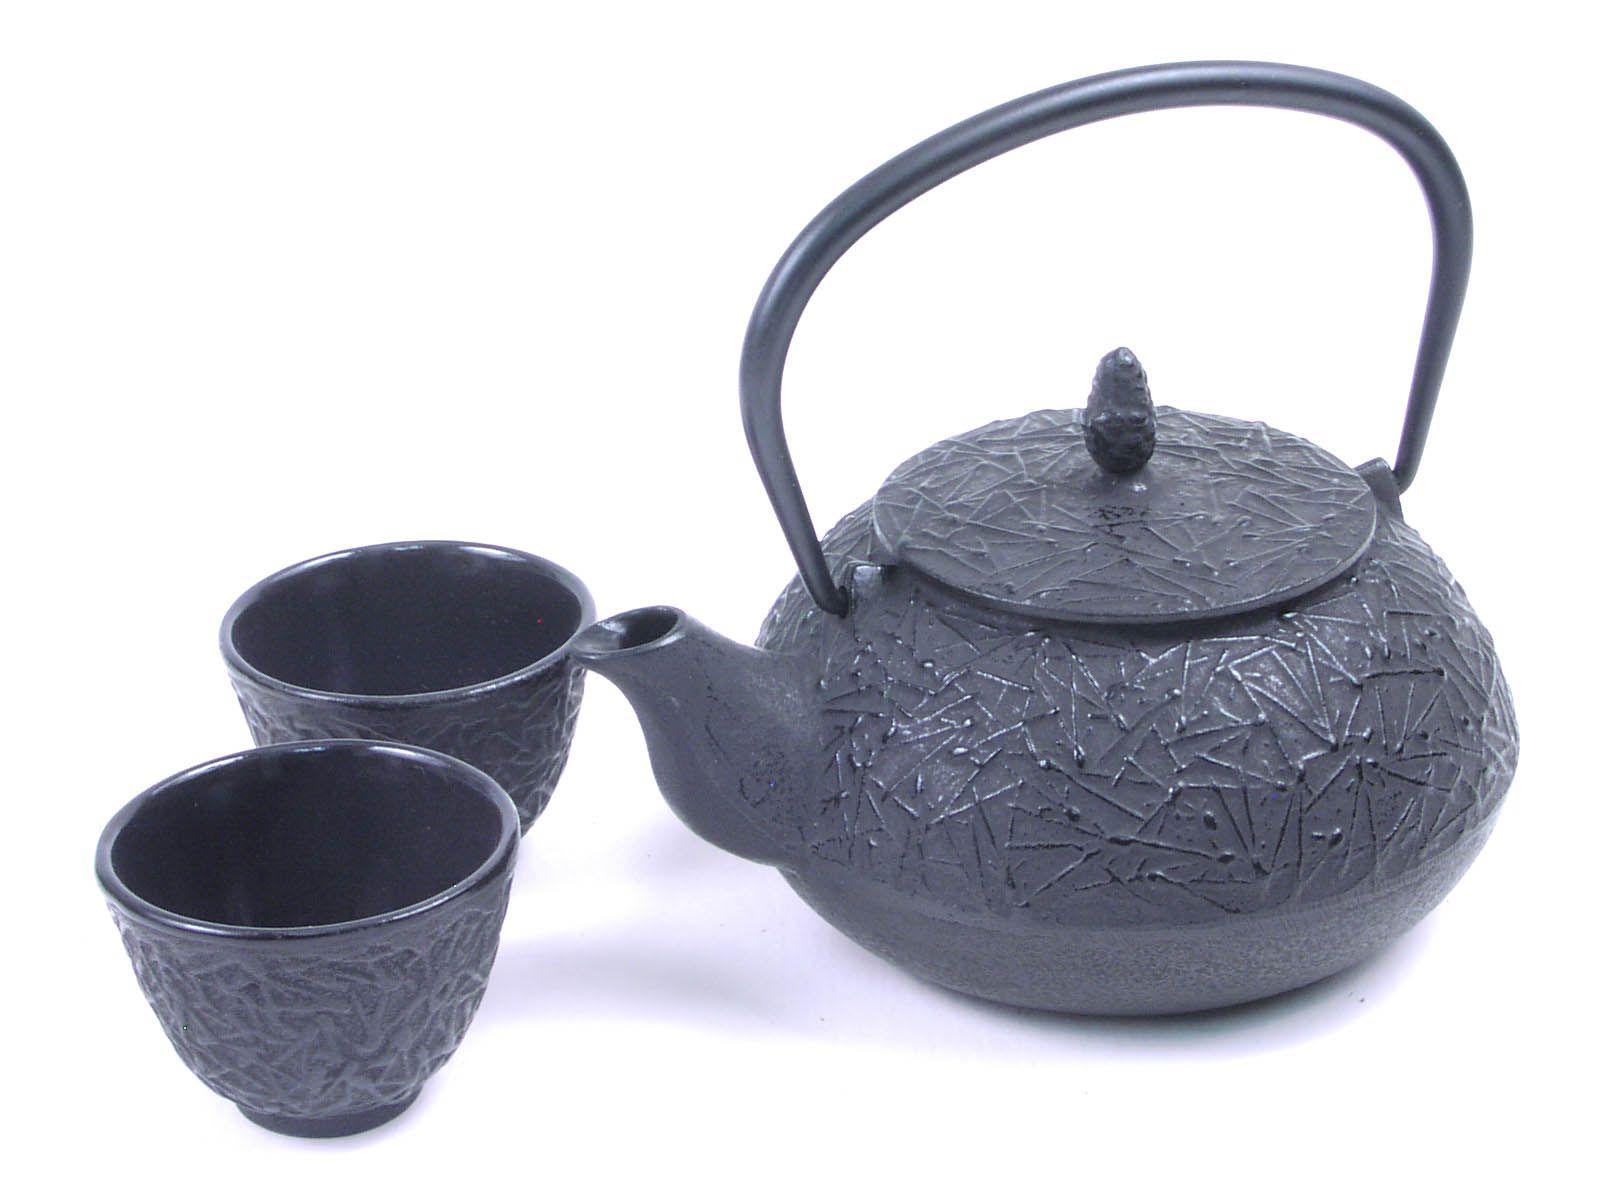 pins and needles tetsubin teapot set cast iron tea sets pinterest